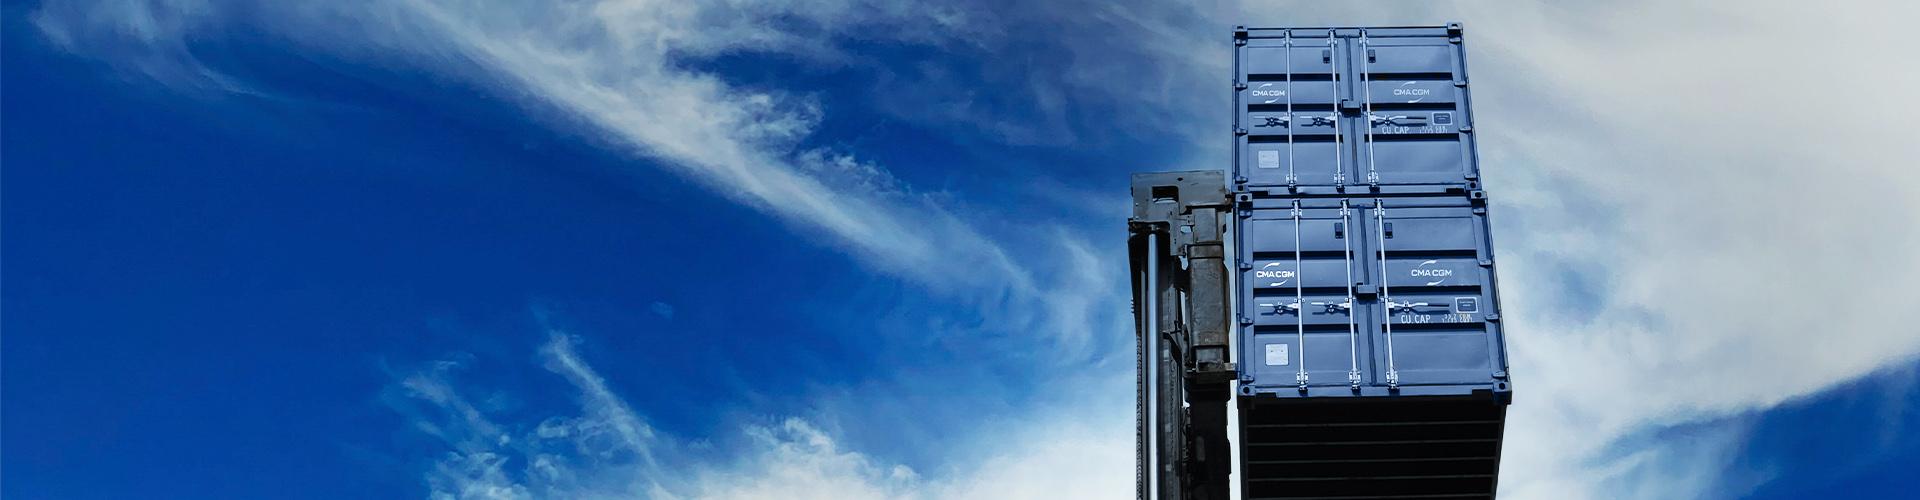 CCIS, CCIS network, CMA CGM Inland Services, CCIS Hamburg, CCIS Duisburg, CCIS Antwerp, CCIS Rotterdam, CCIS France, Progeco, Container Depot Services, Container Services, Container Transport, Full Container